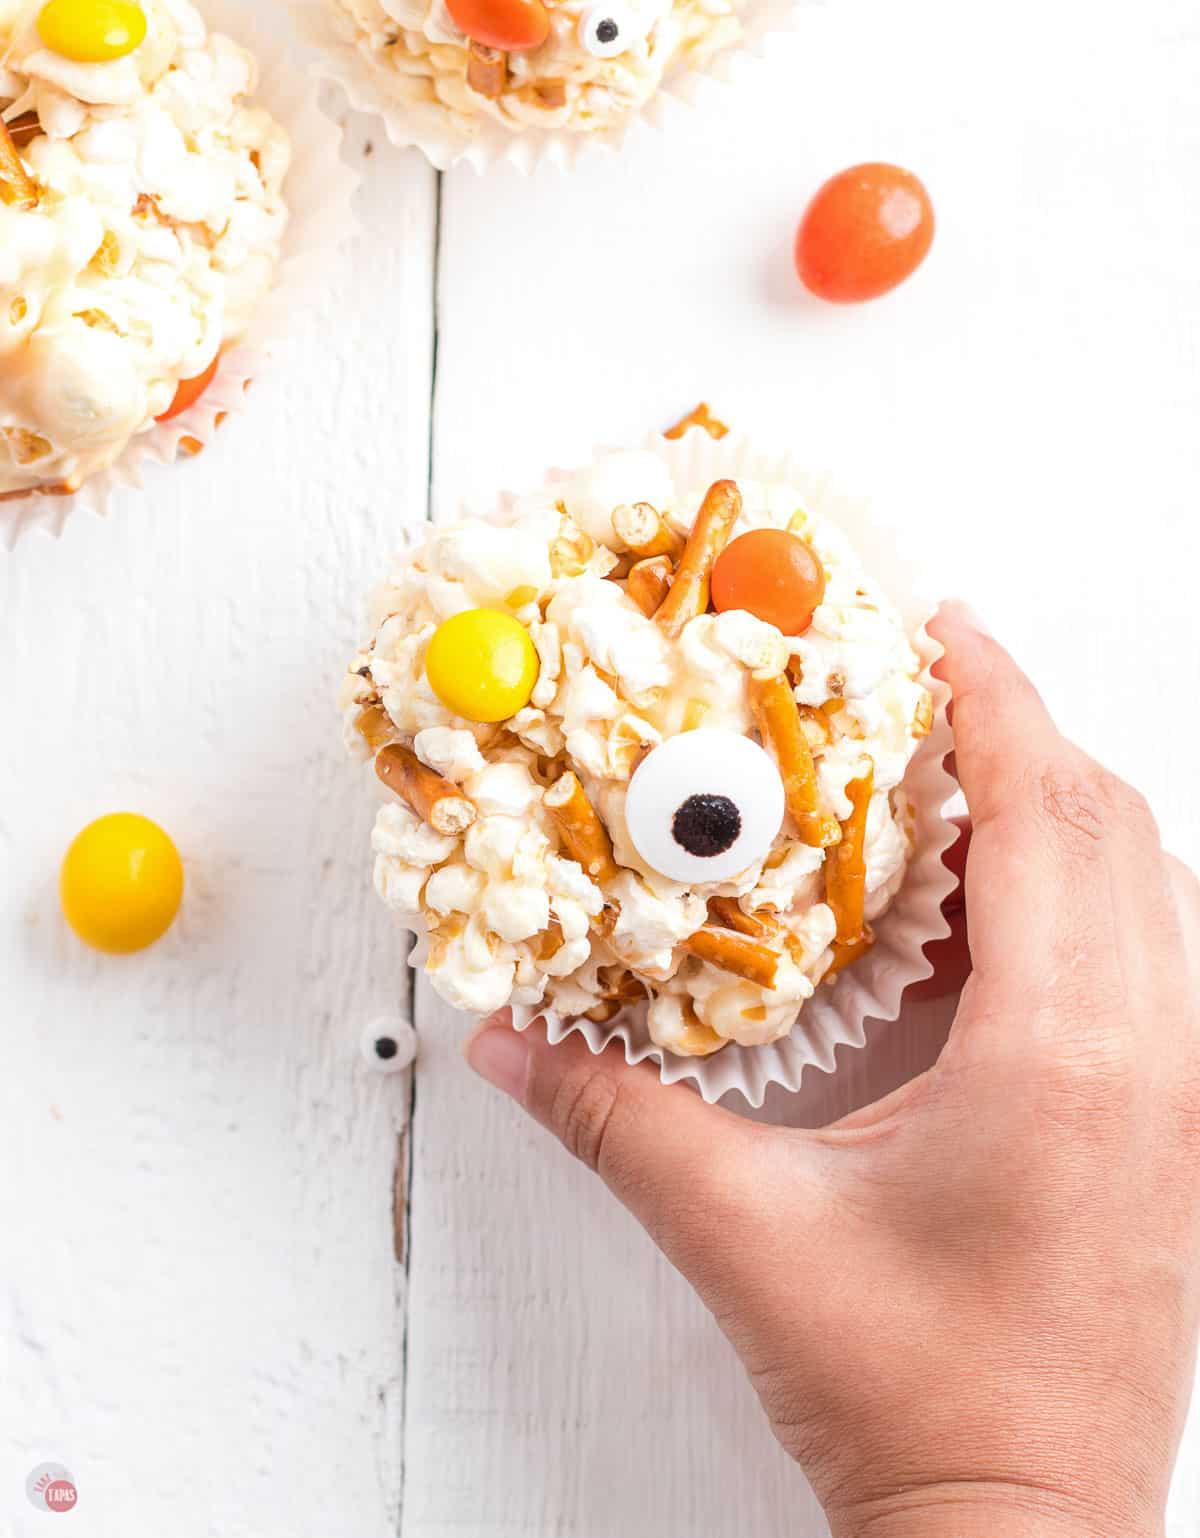 hand holding popcorn ball